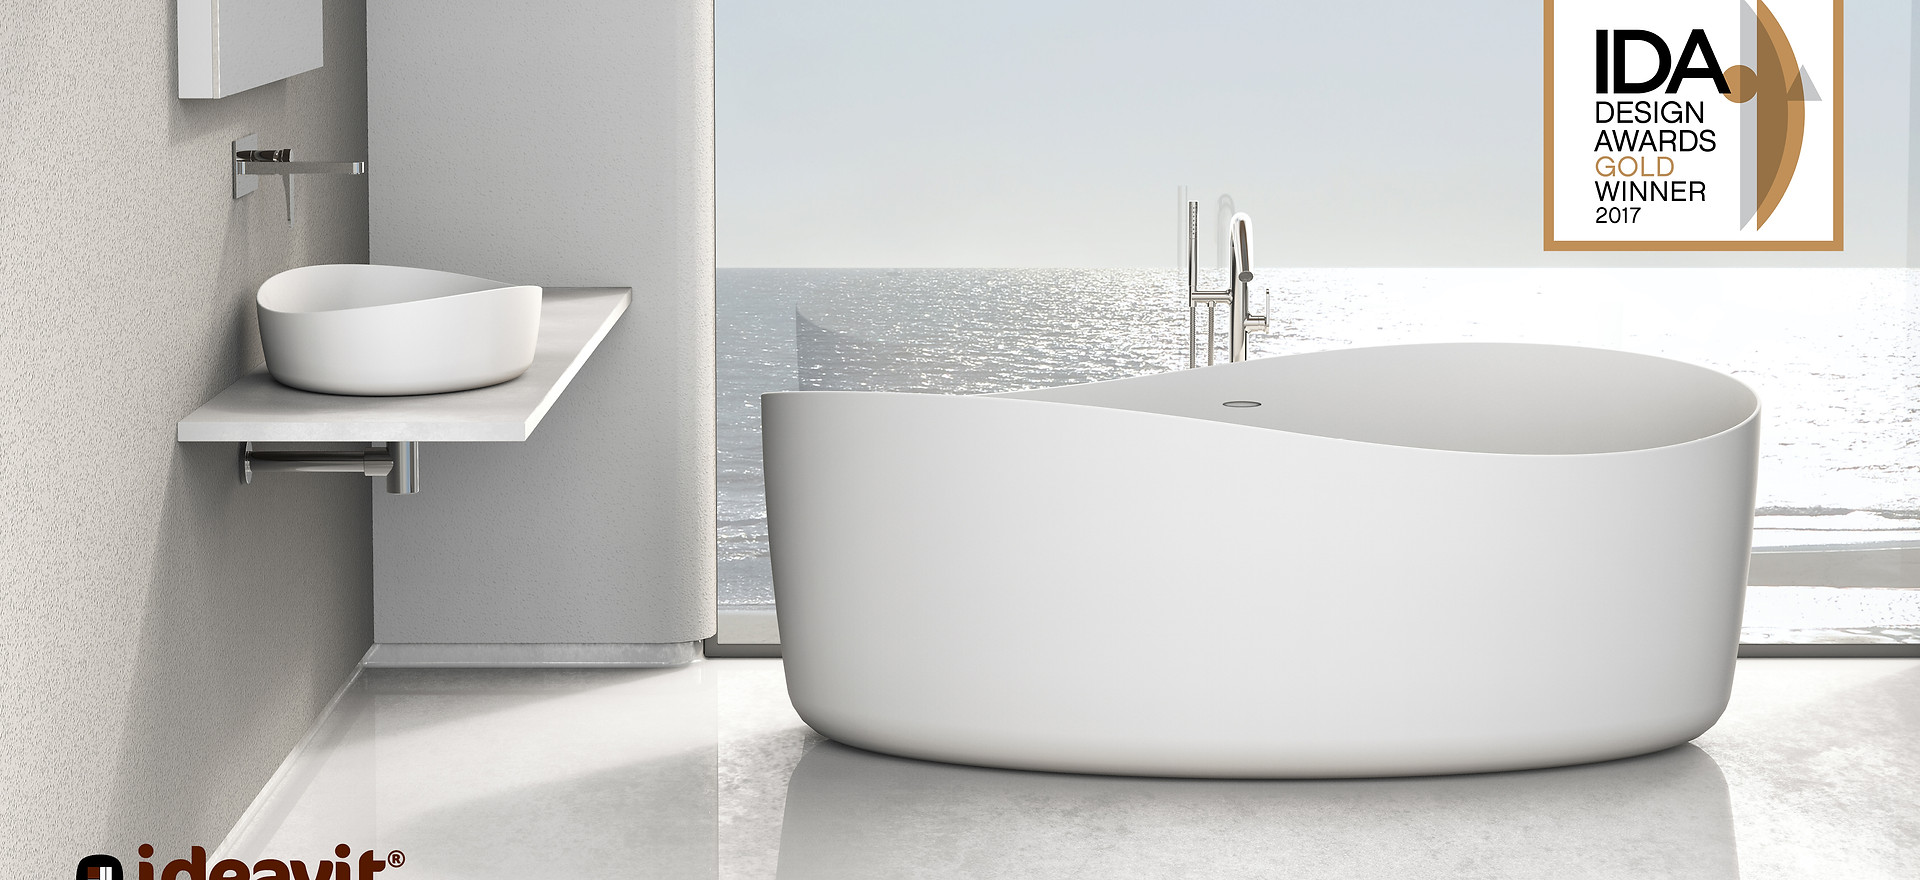 SOLIDHARMONY - Design Series for Ideavit B.V. - Bathtub + Washbasin